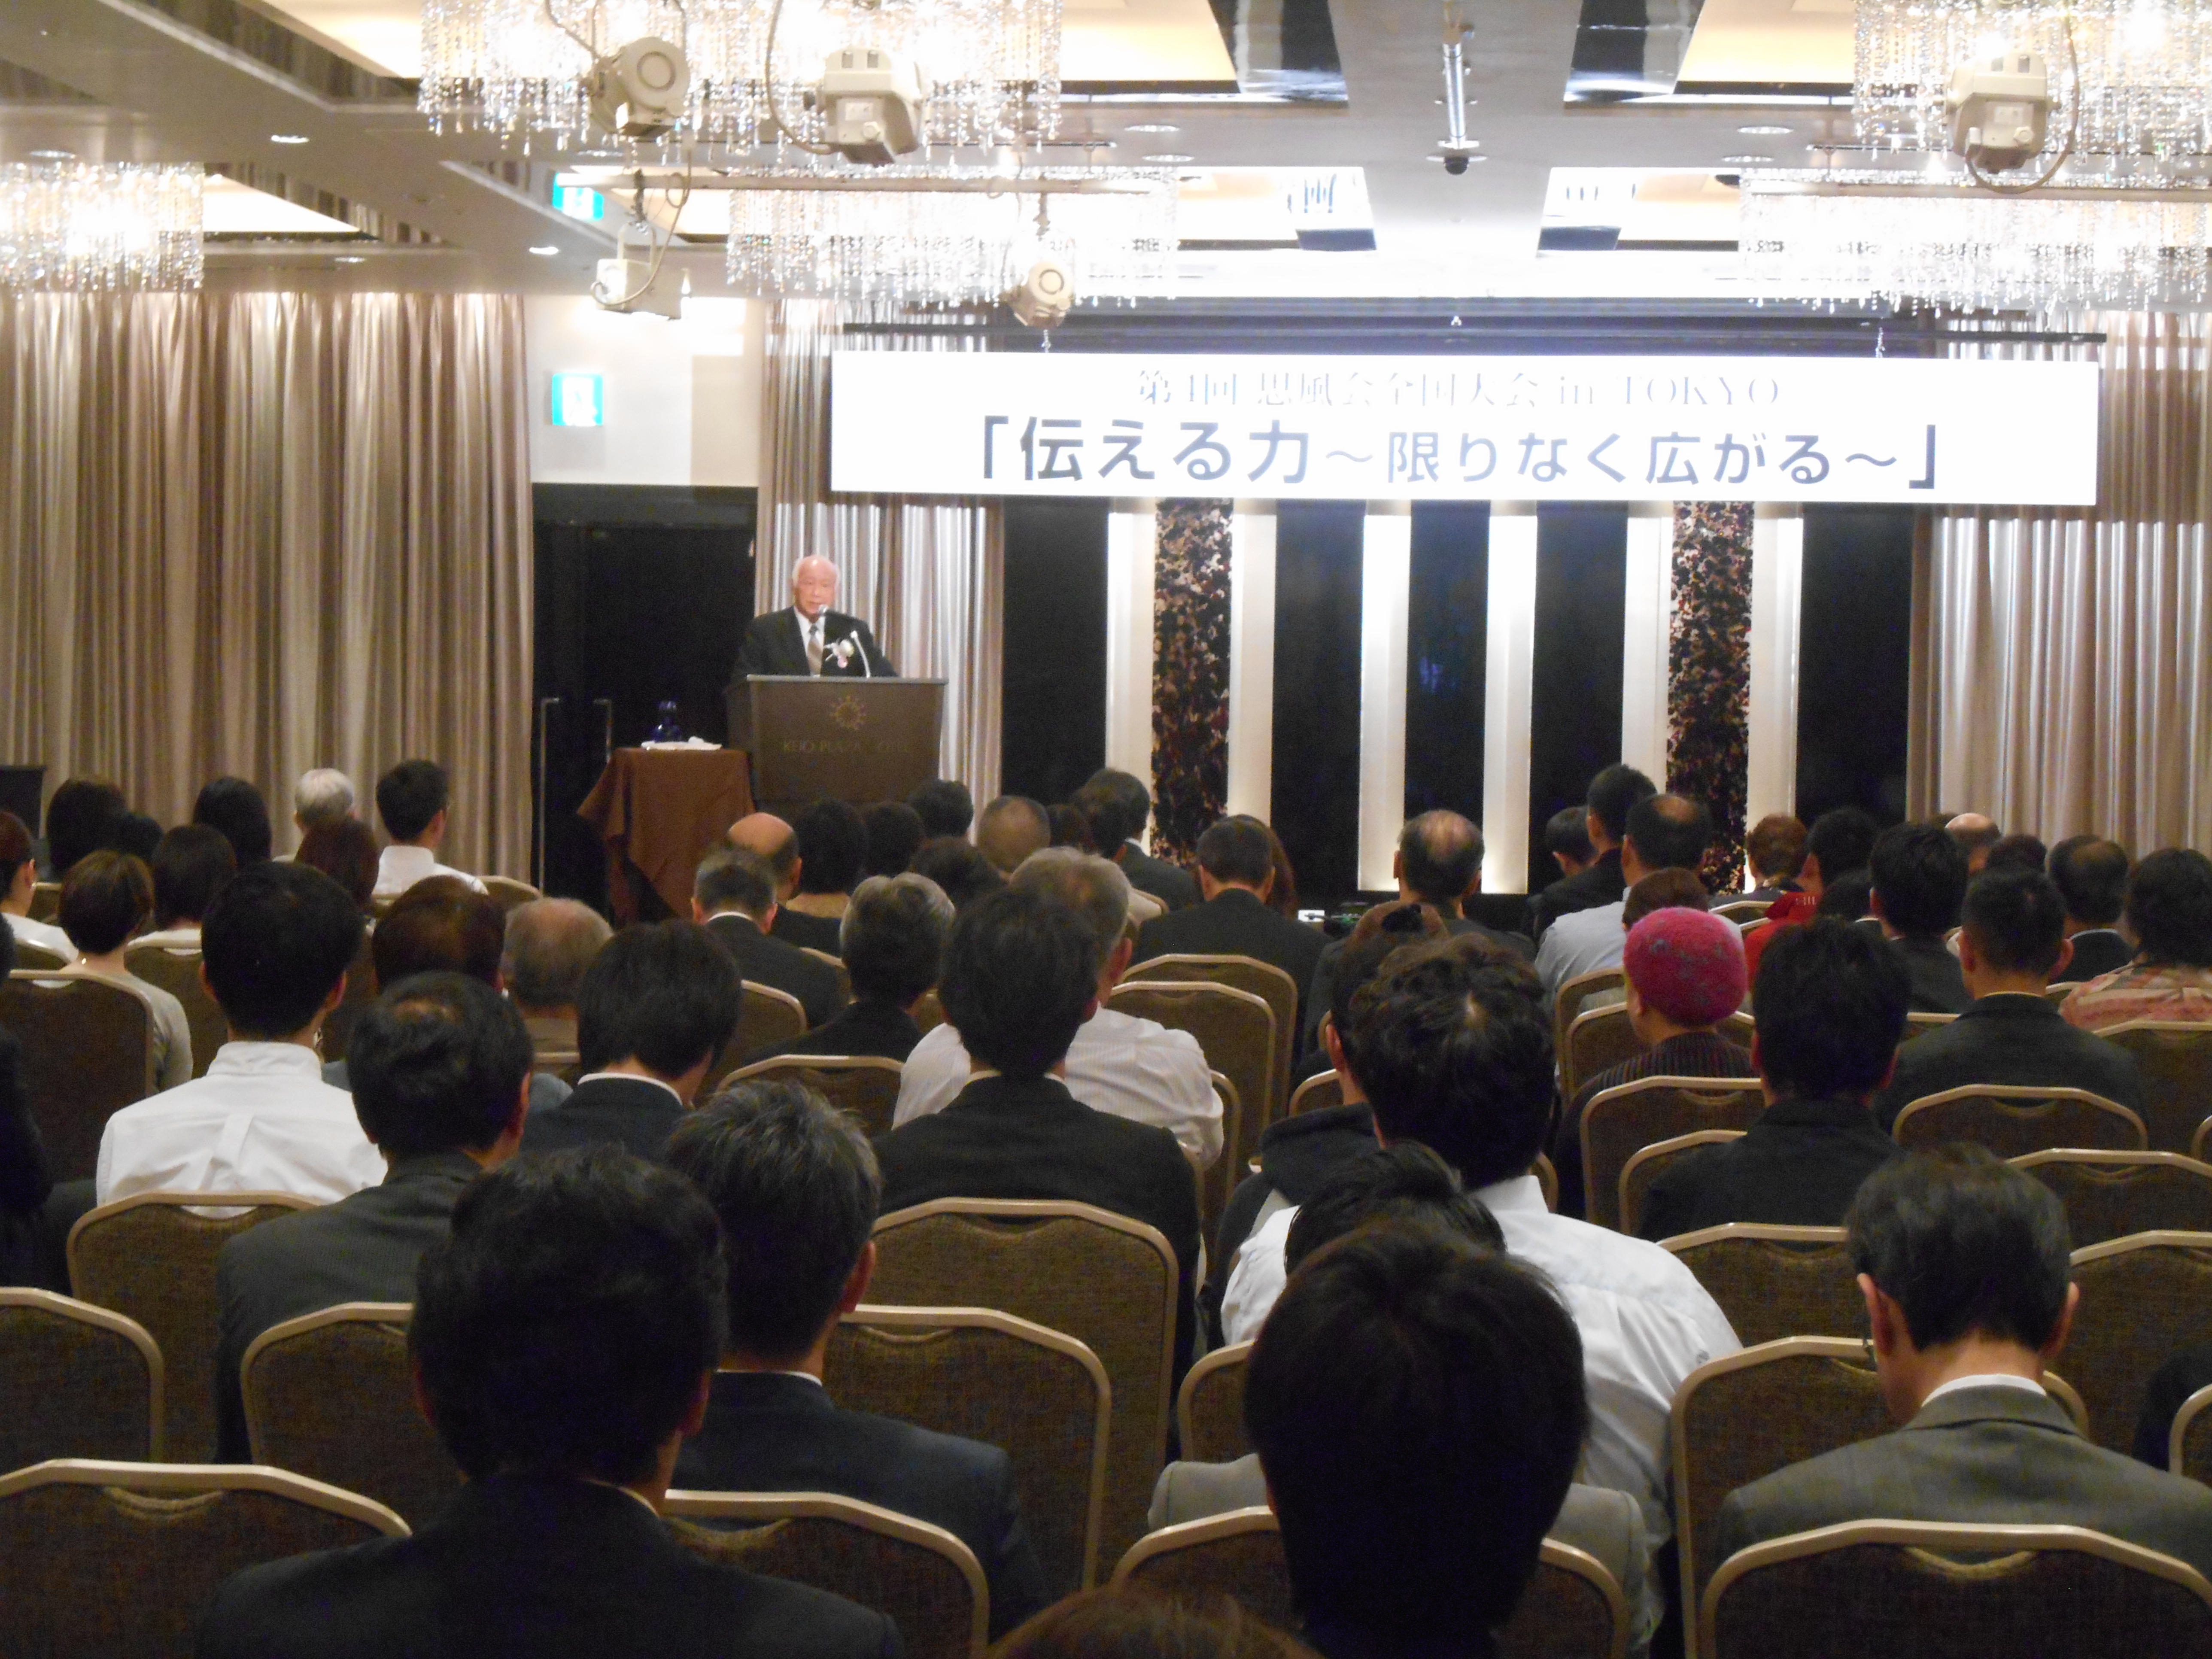 DSCN2081 - 平成30年度 東京思風塾 4月7日(土)「時代が問題をつくり、問題が人物をつくる」